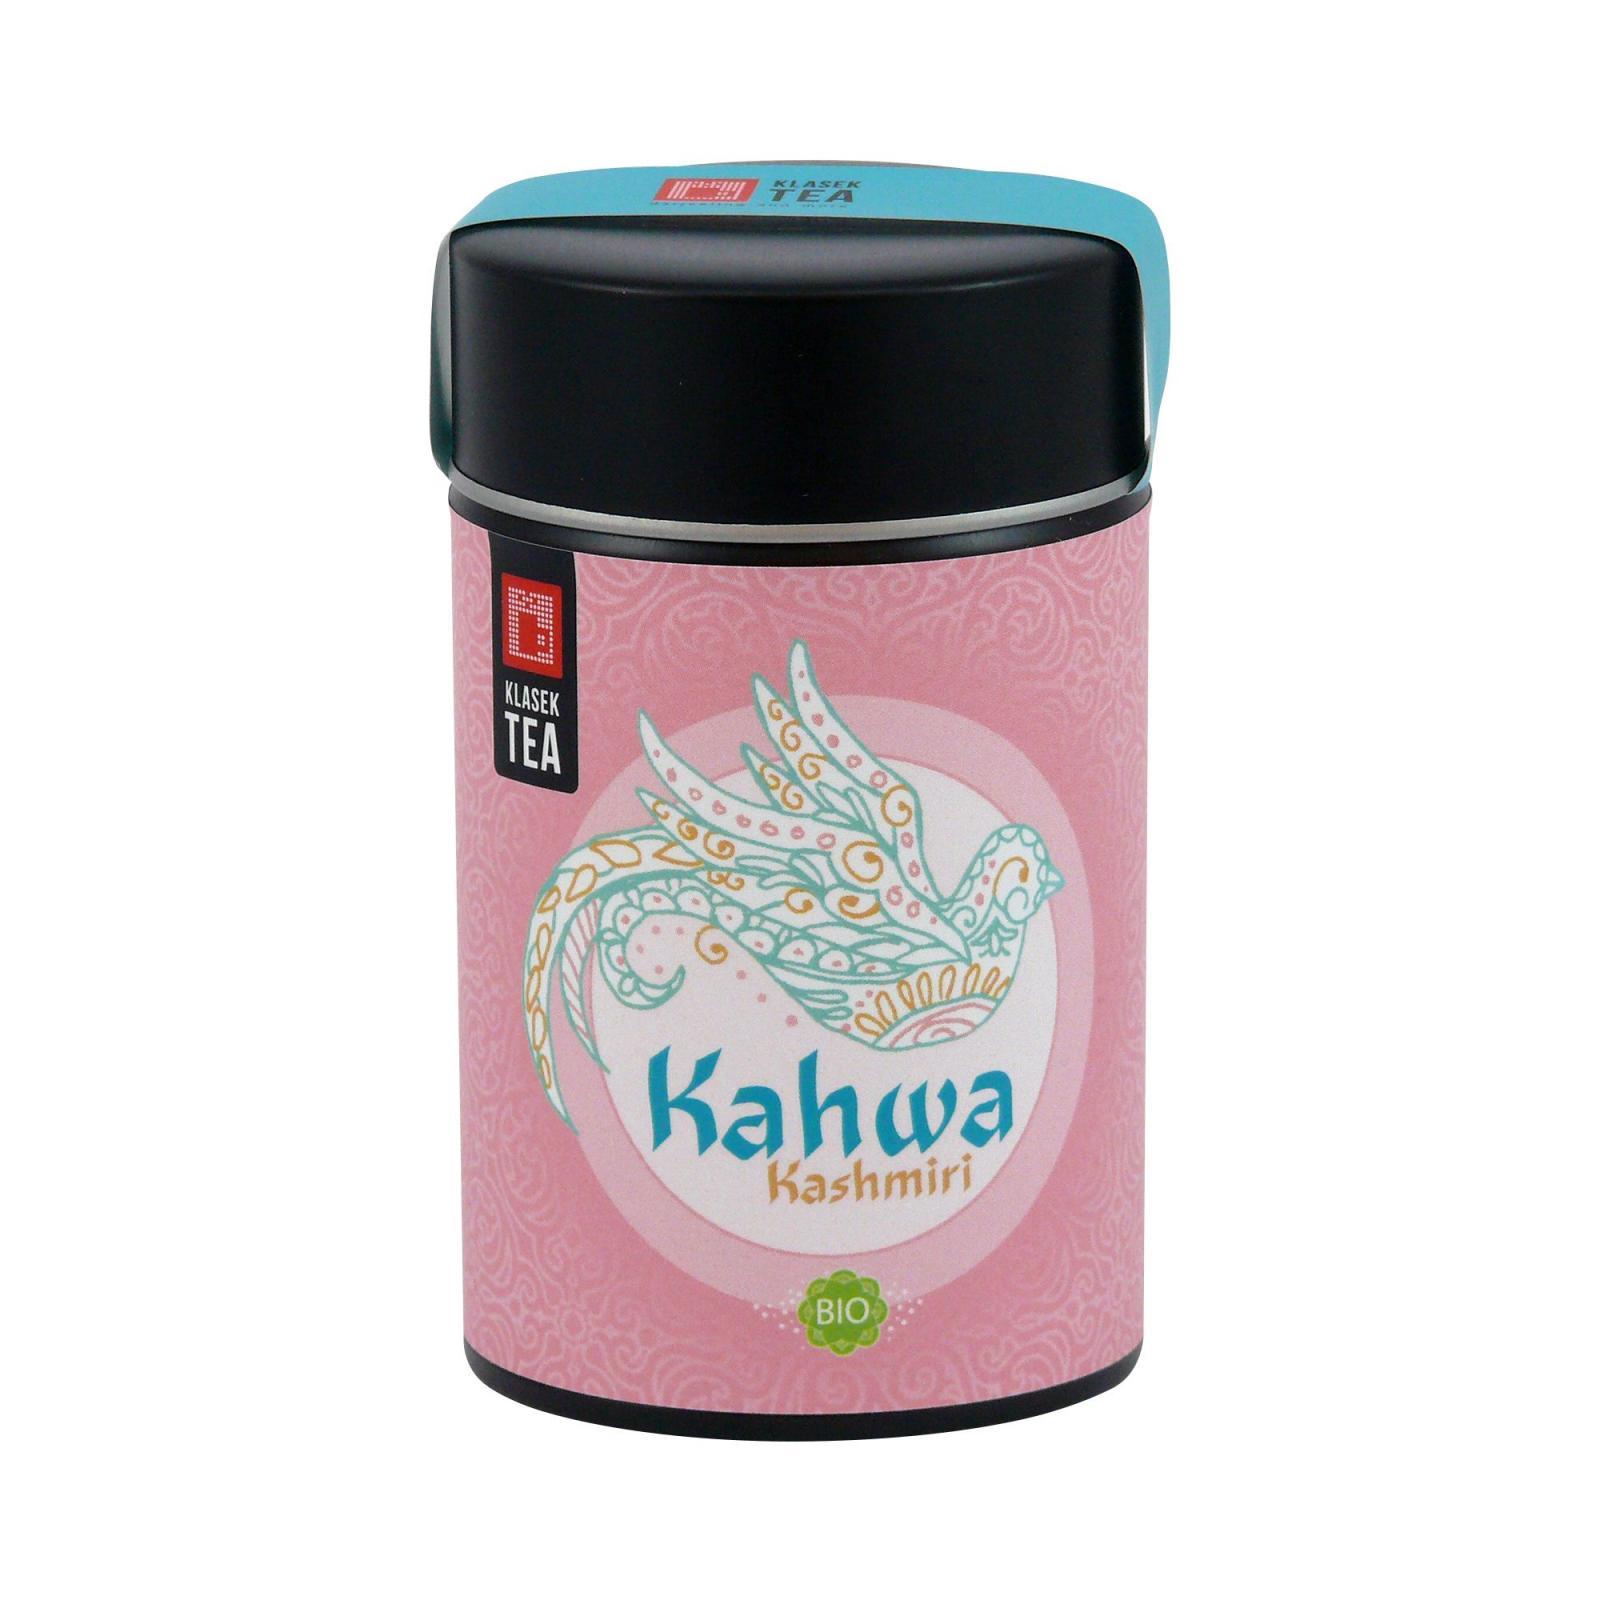 Keiko Zelený čaj Kashmiri Kahwa, kovová dóza 60 g